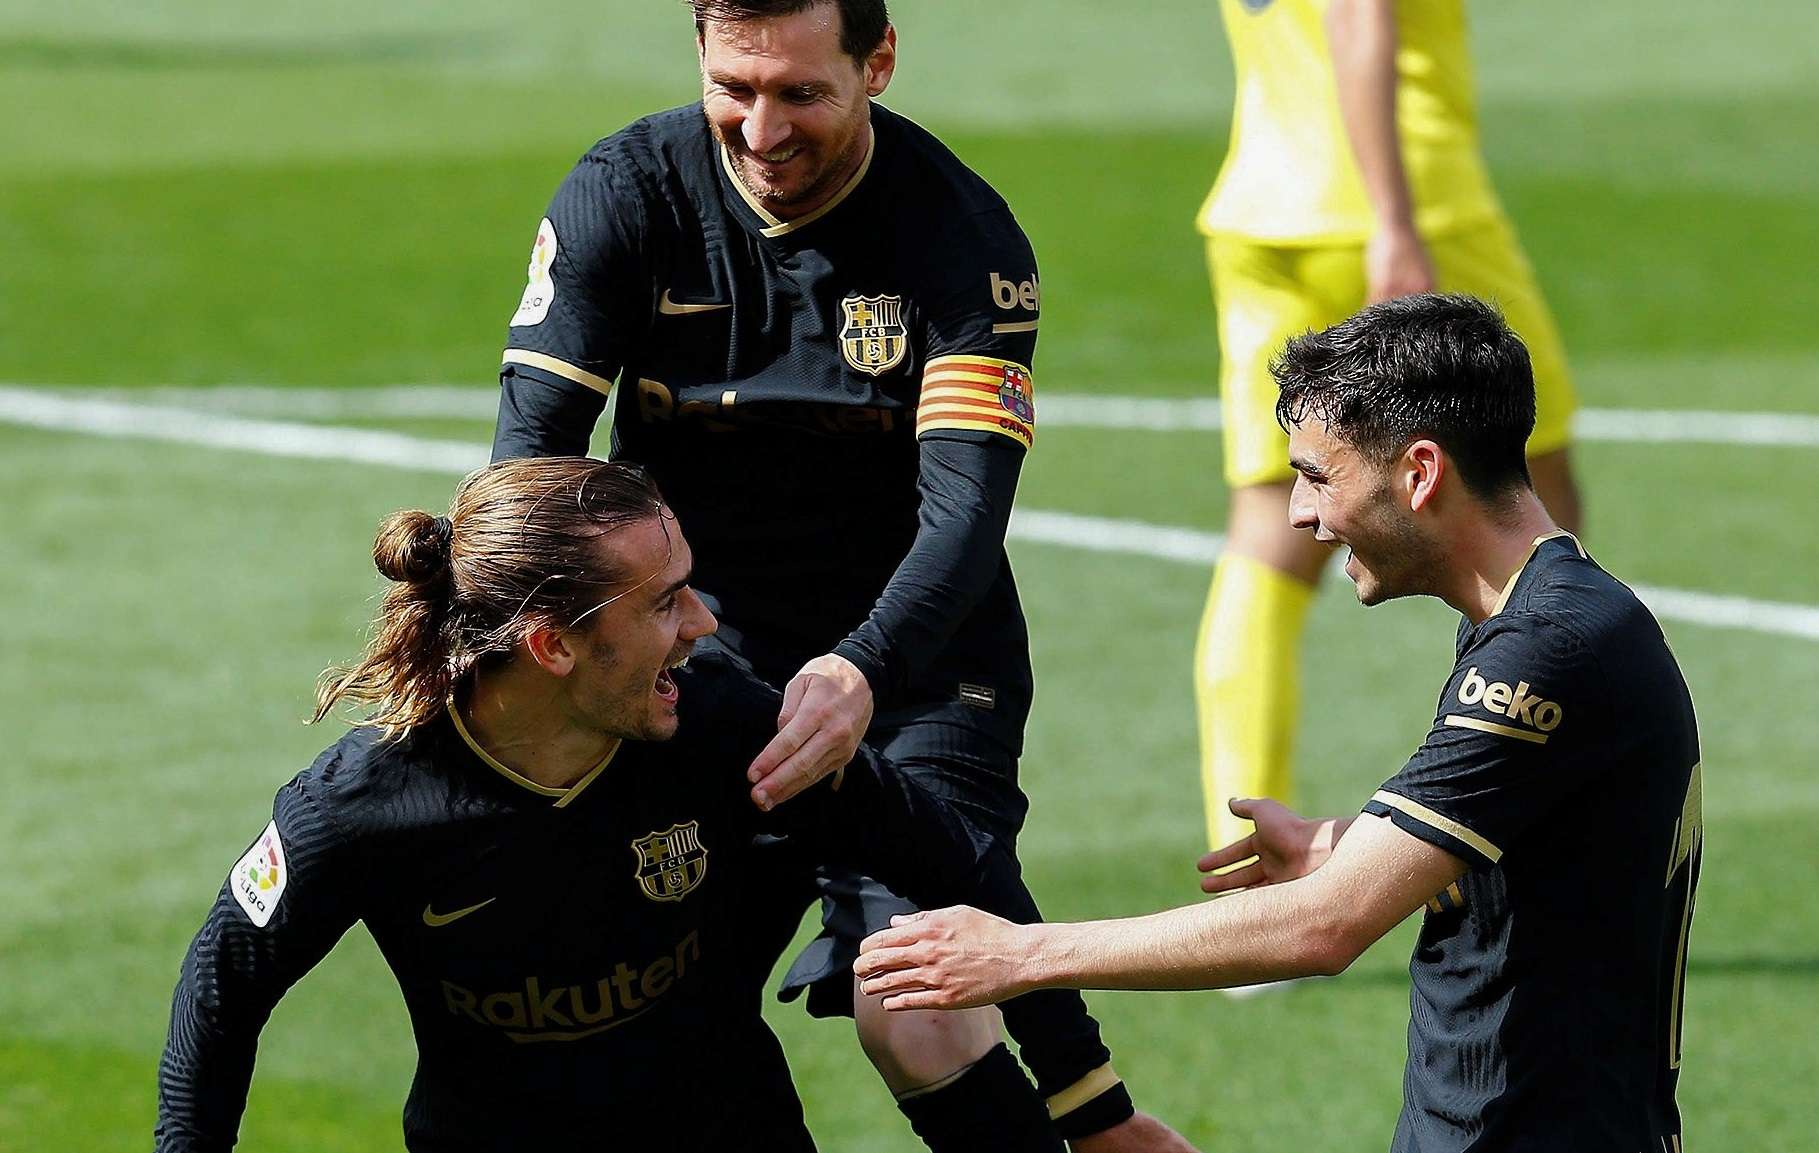 Griezmann y Messi celebran un gol del francés al Villarreal. /EFE